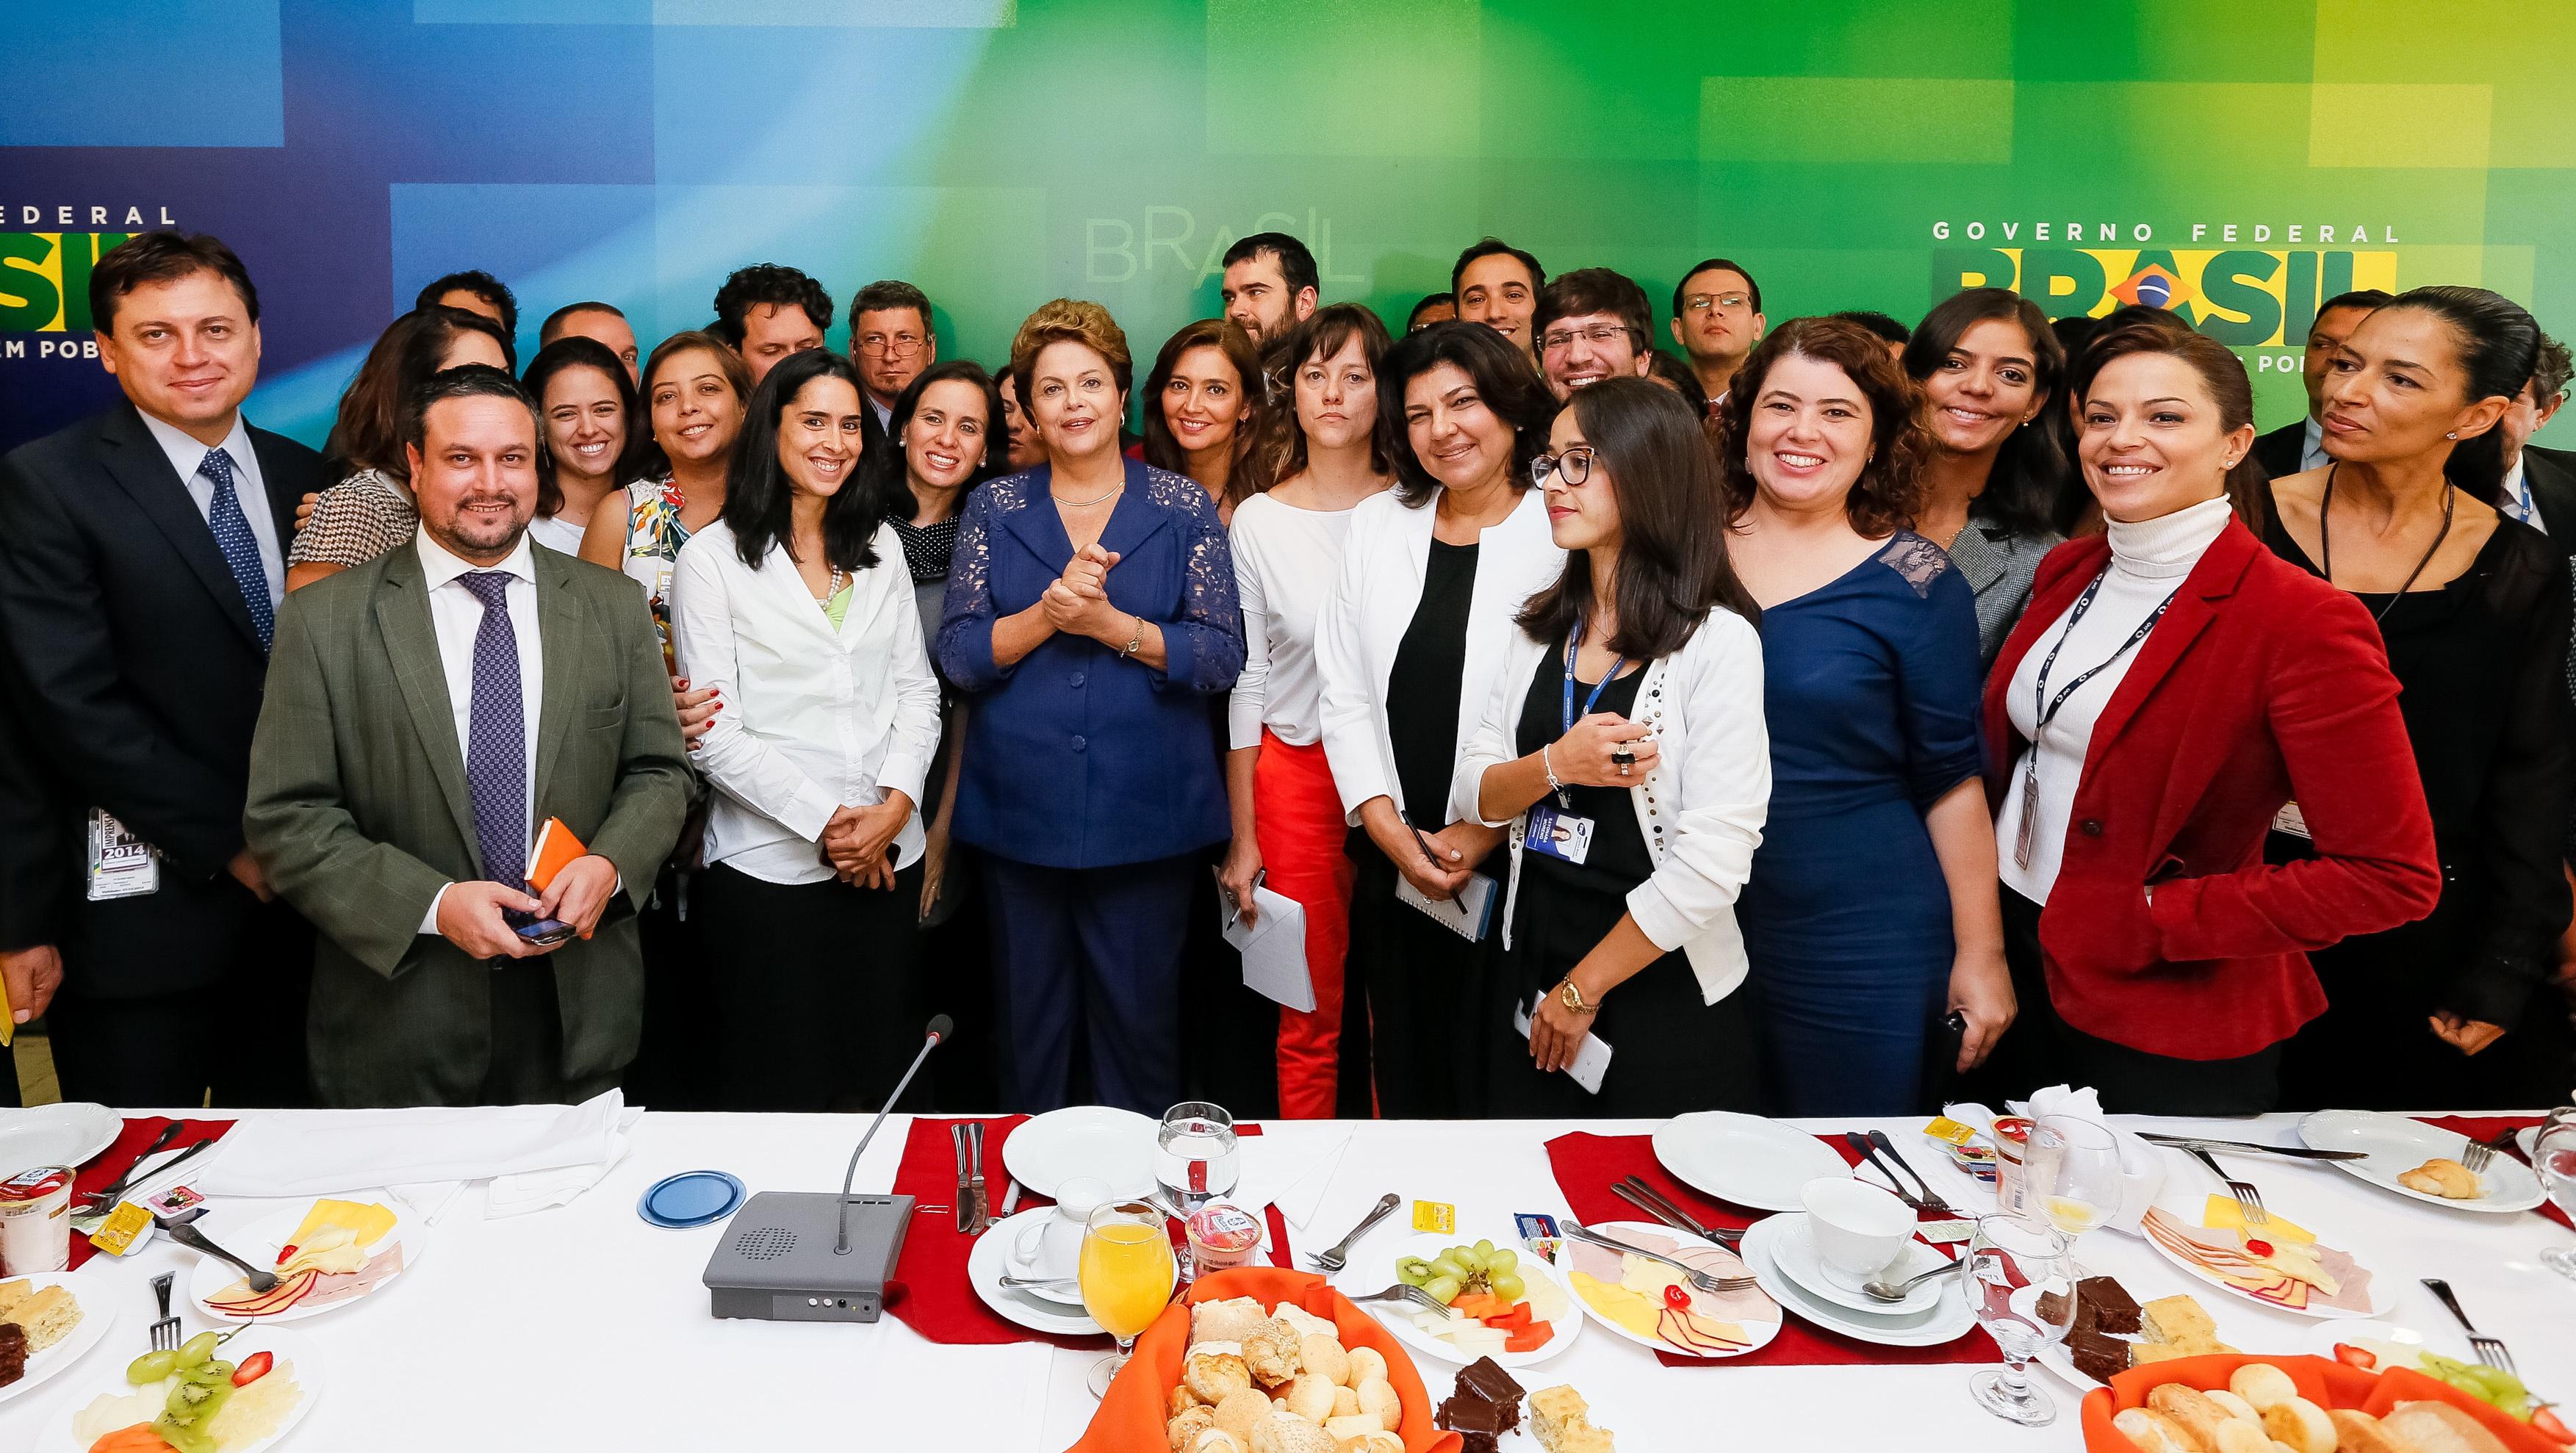 Foto-Dilma-Jornalistas-22dez2014